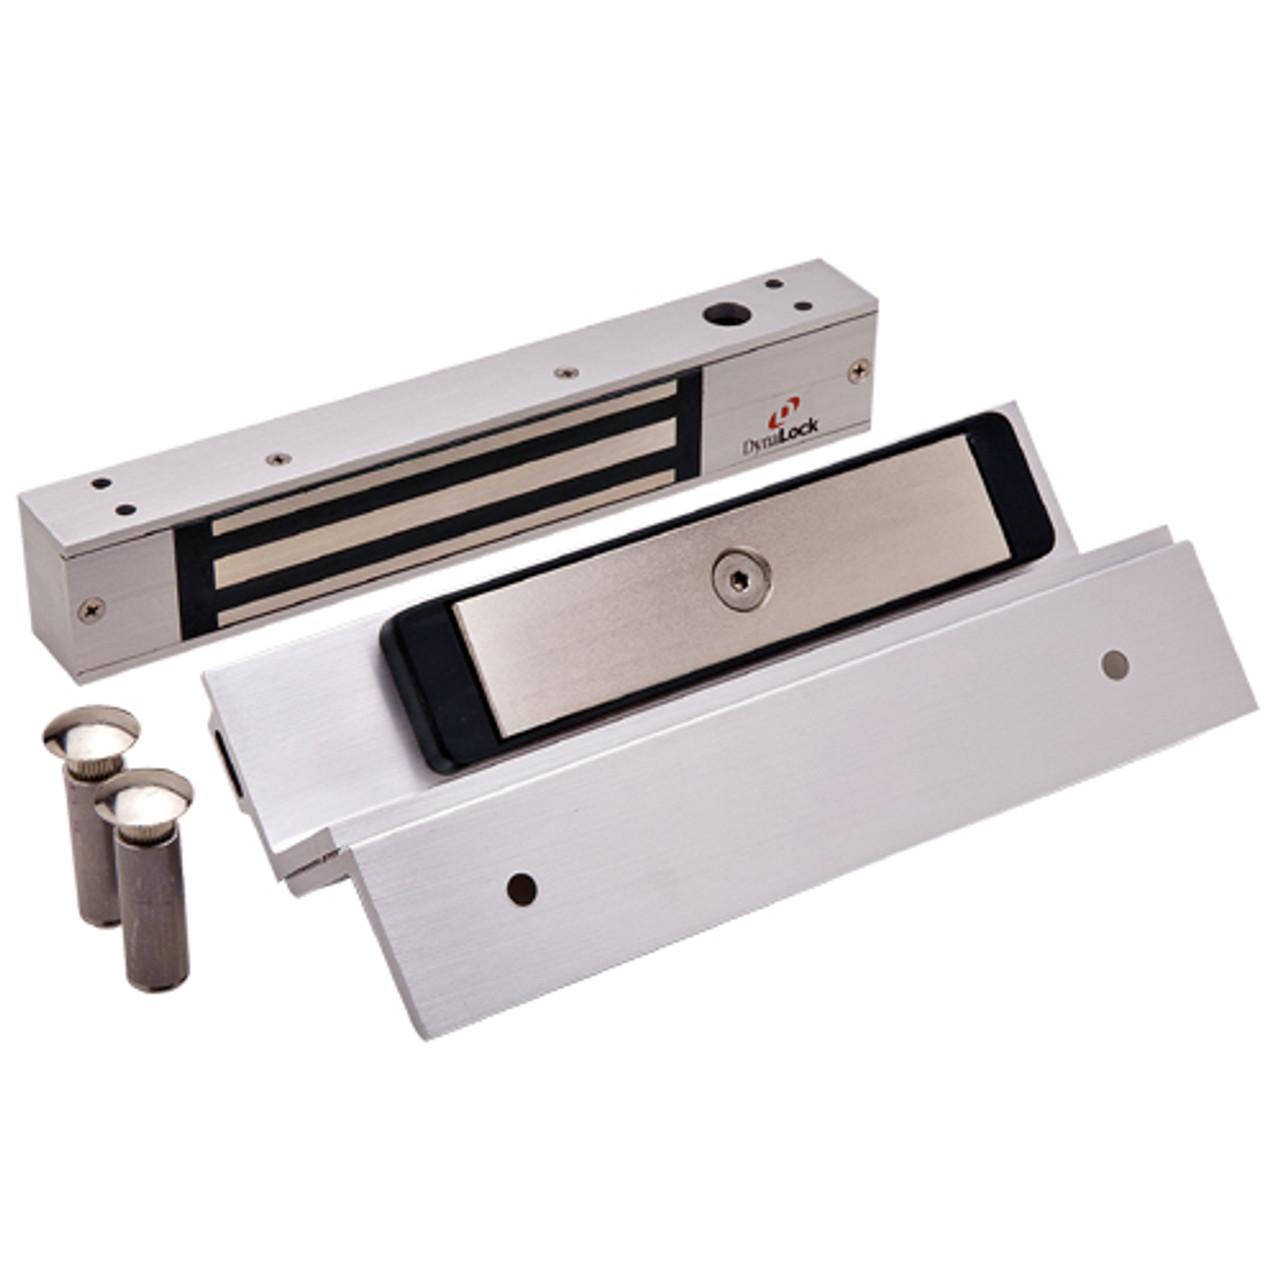 2511TJ-US28-DSM DynaLock 2500 Series 650 LB Mini-Mag Single Electromagnetic Lock for Inswing Door with Door Status Switch in Satin Aluminum